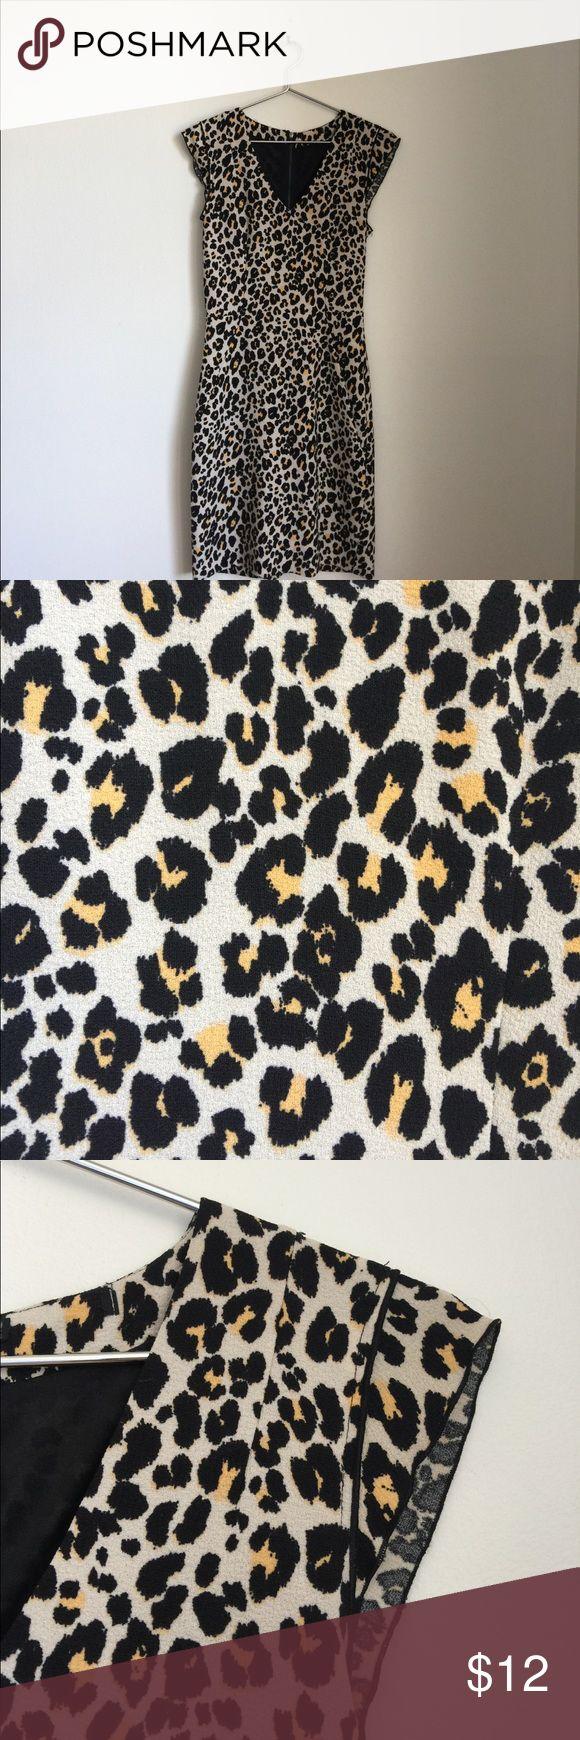 Panther print in crêpe stretch mini dress Panther print in crêpe stretch mini dress. In Creme black and yellow H&M Dresses Mini